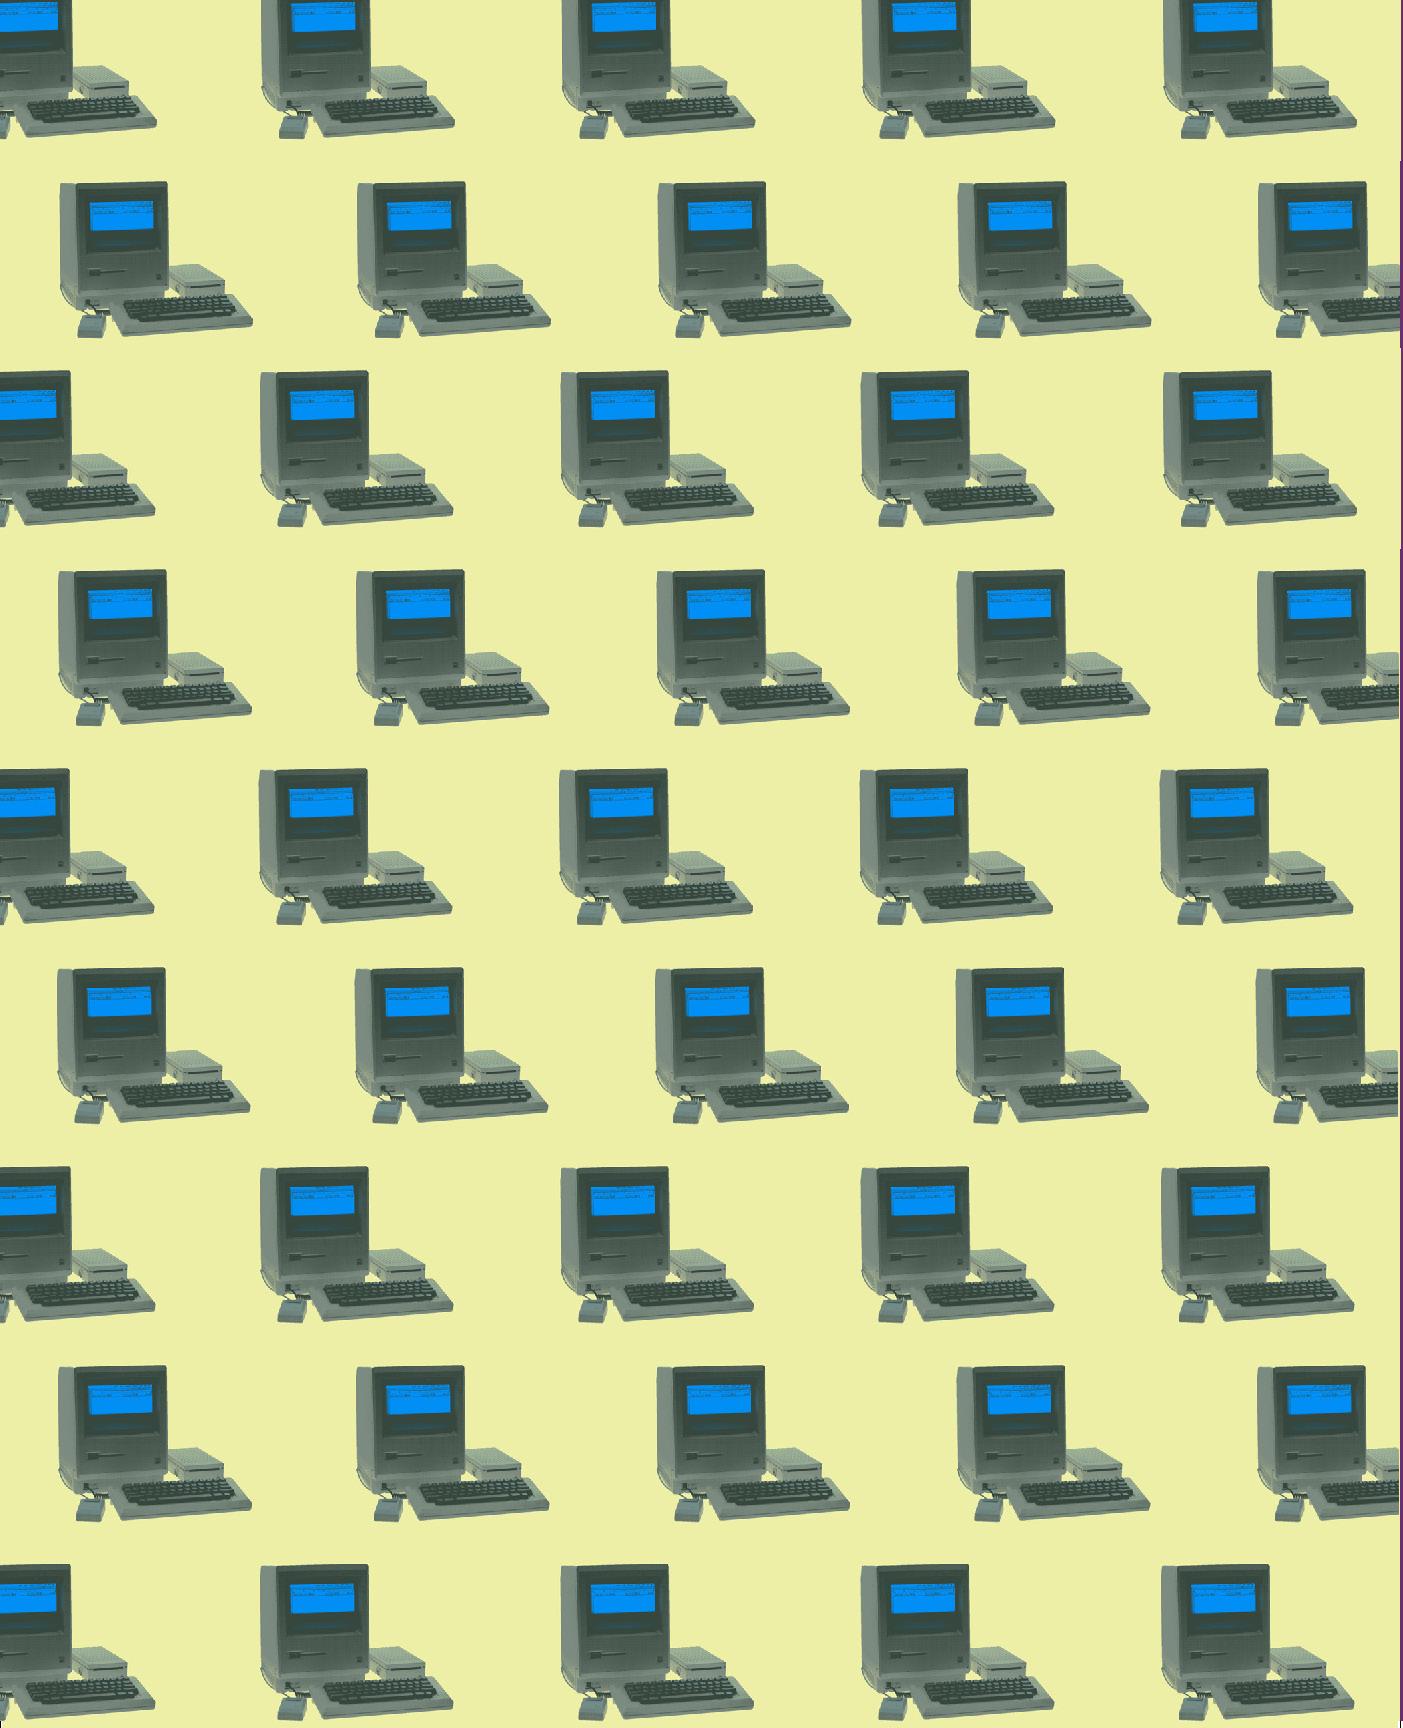 large_Page_062.jpg